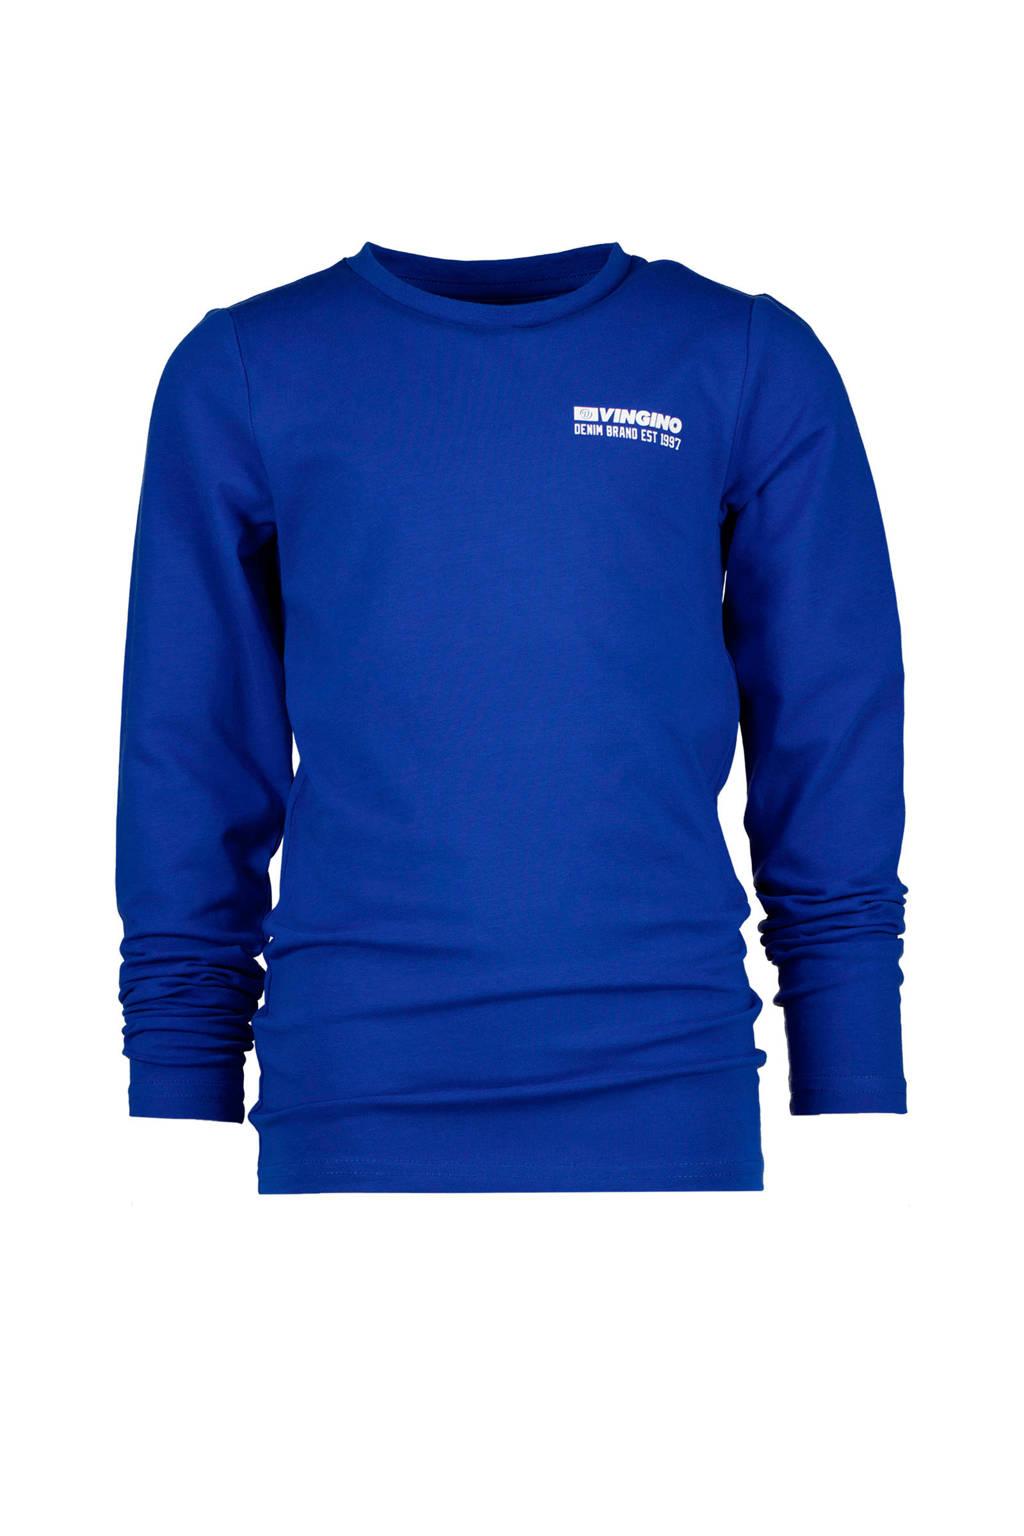 Vingino longsleeve Jefbo met logo hardblauw, Hardblauw